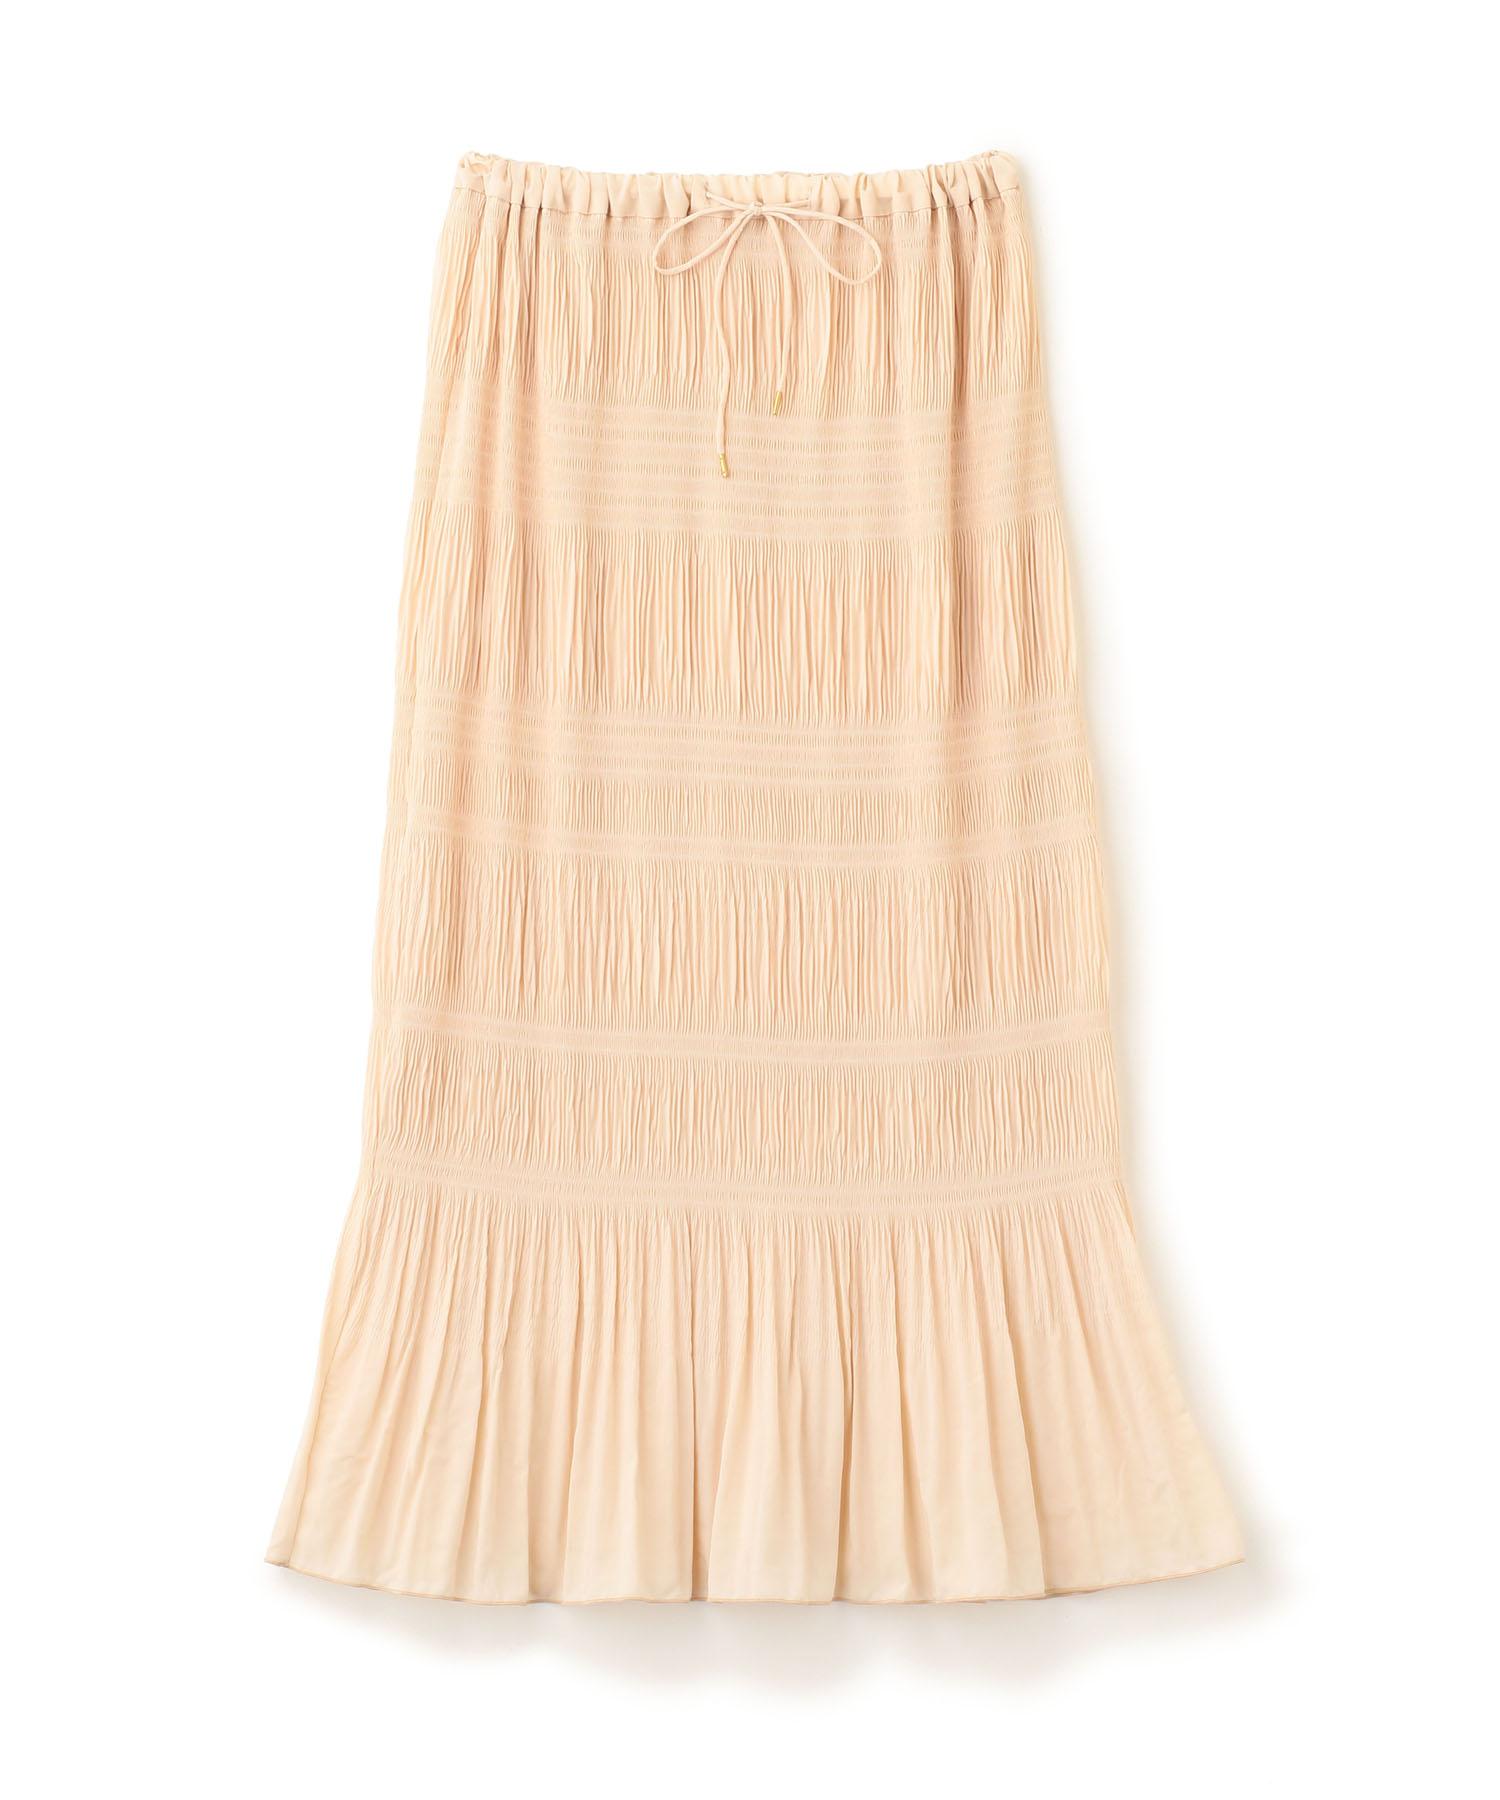 Shirring Pleats Skirt